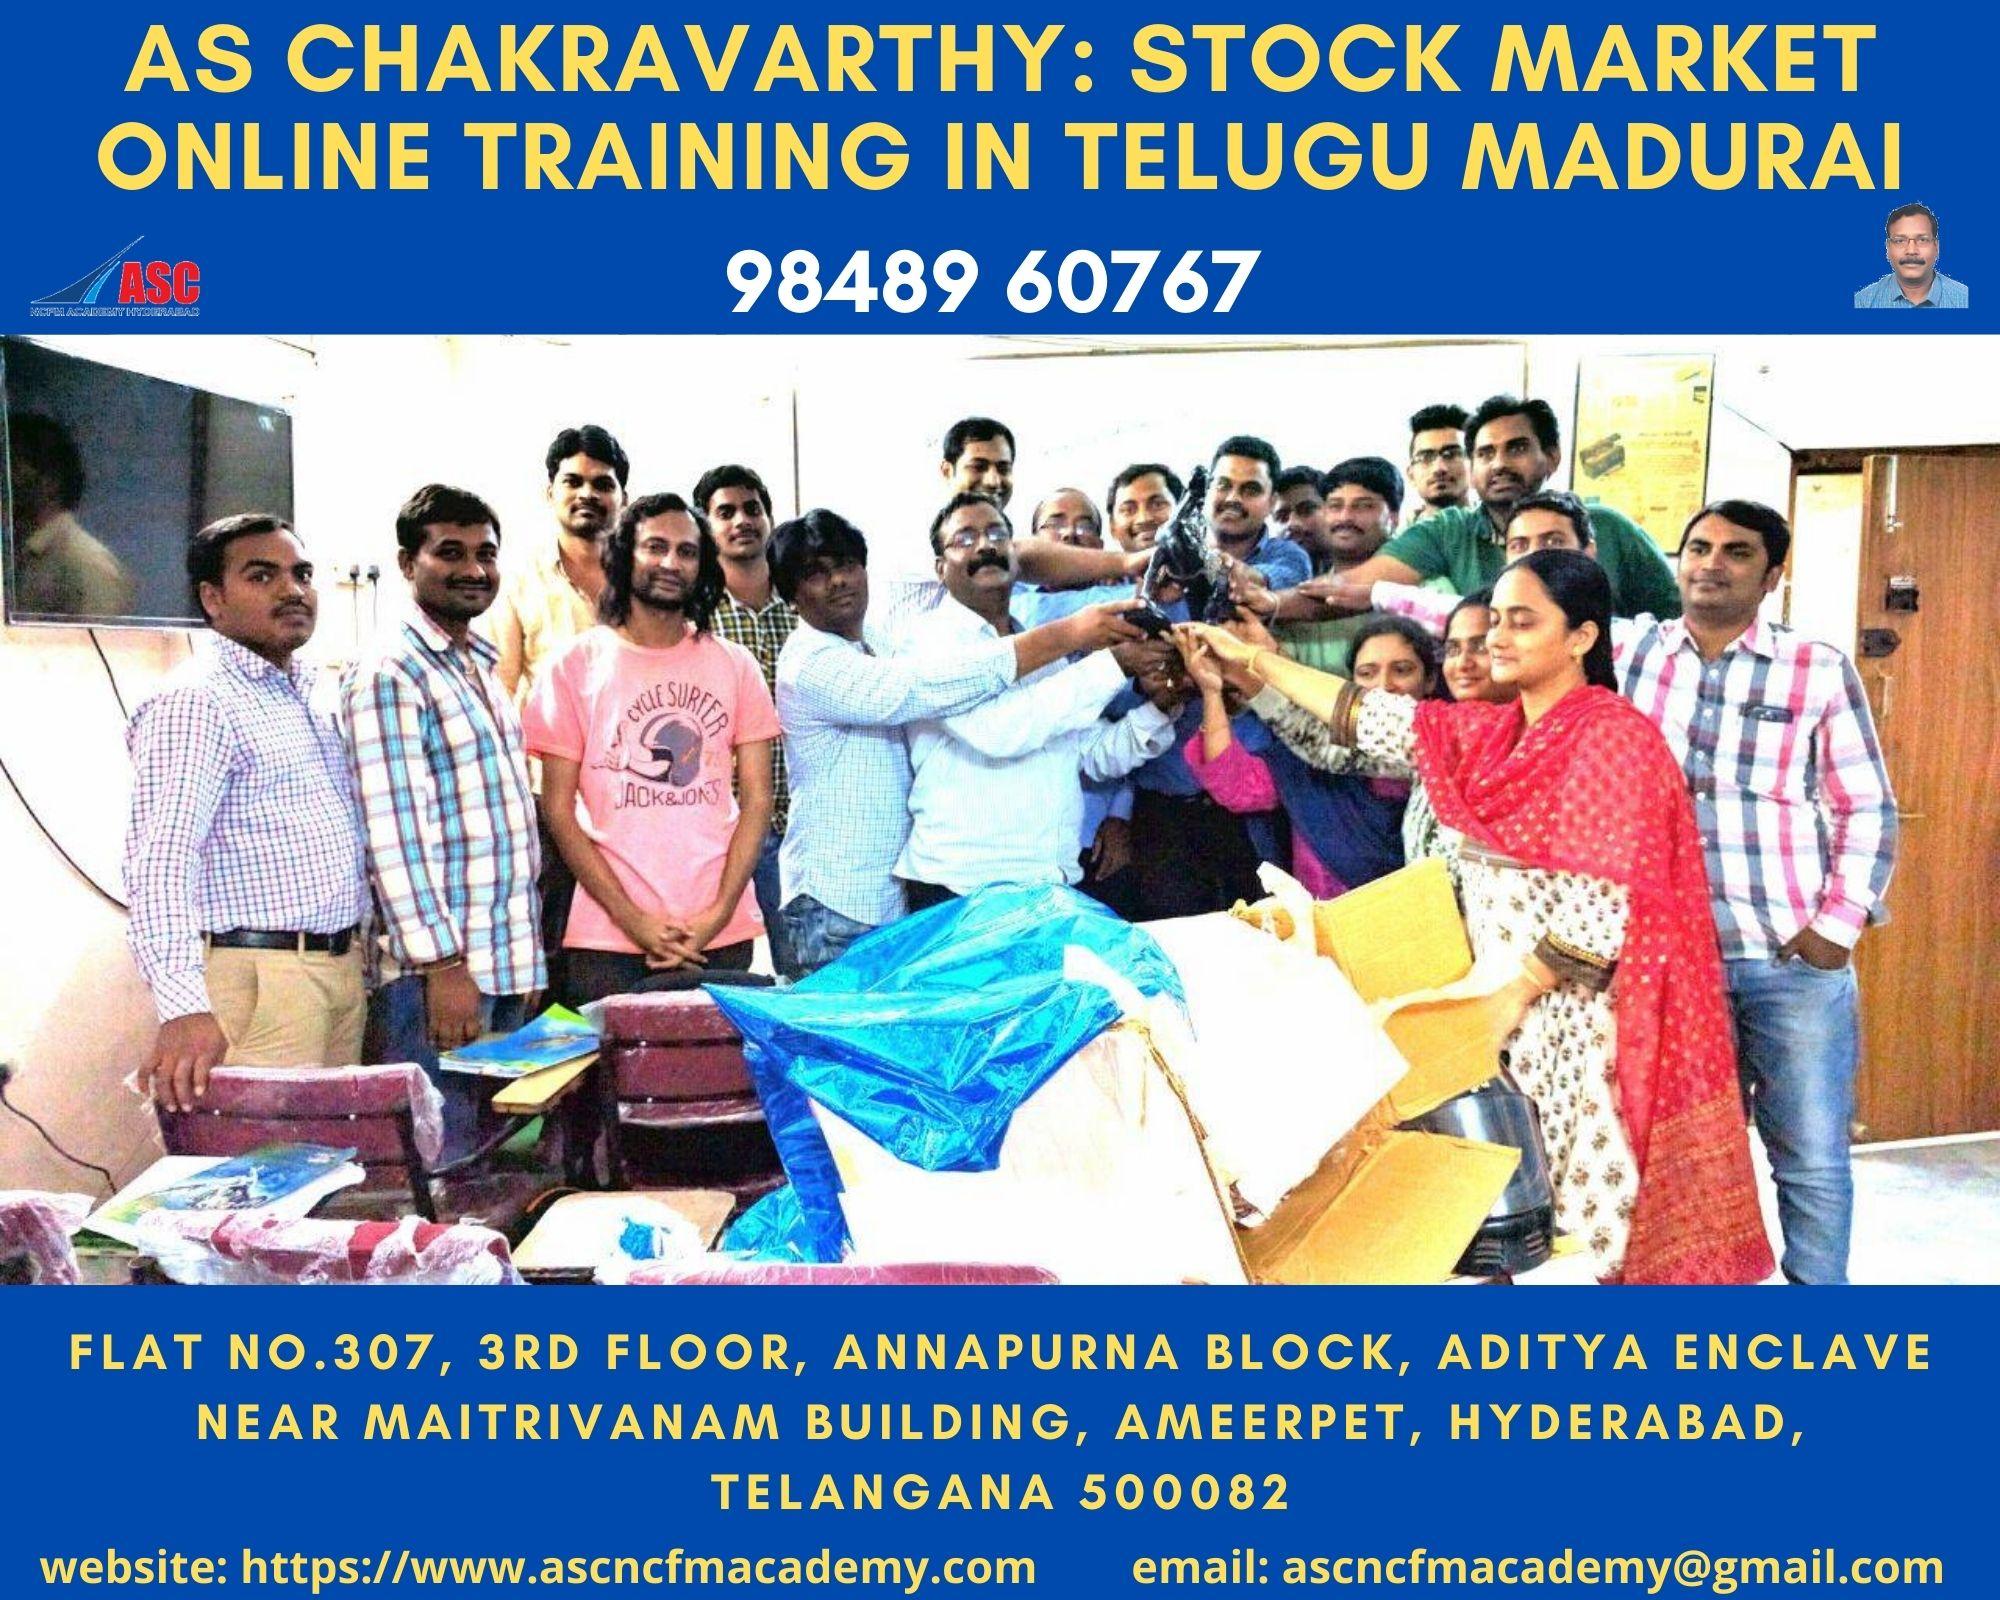 Online Stock Market Technical Training in Telugu Madurai